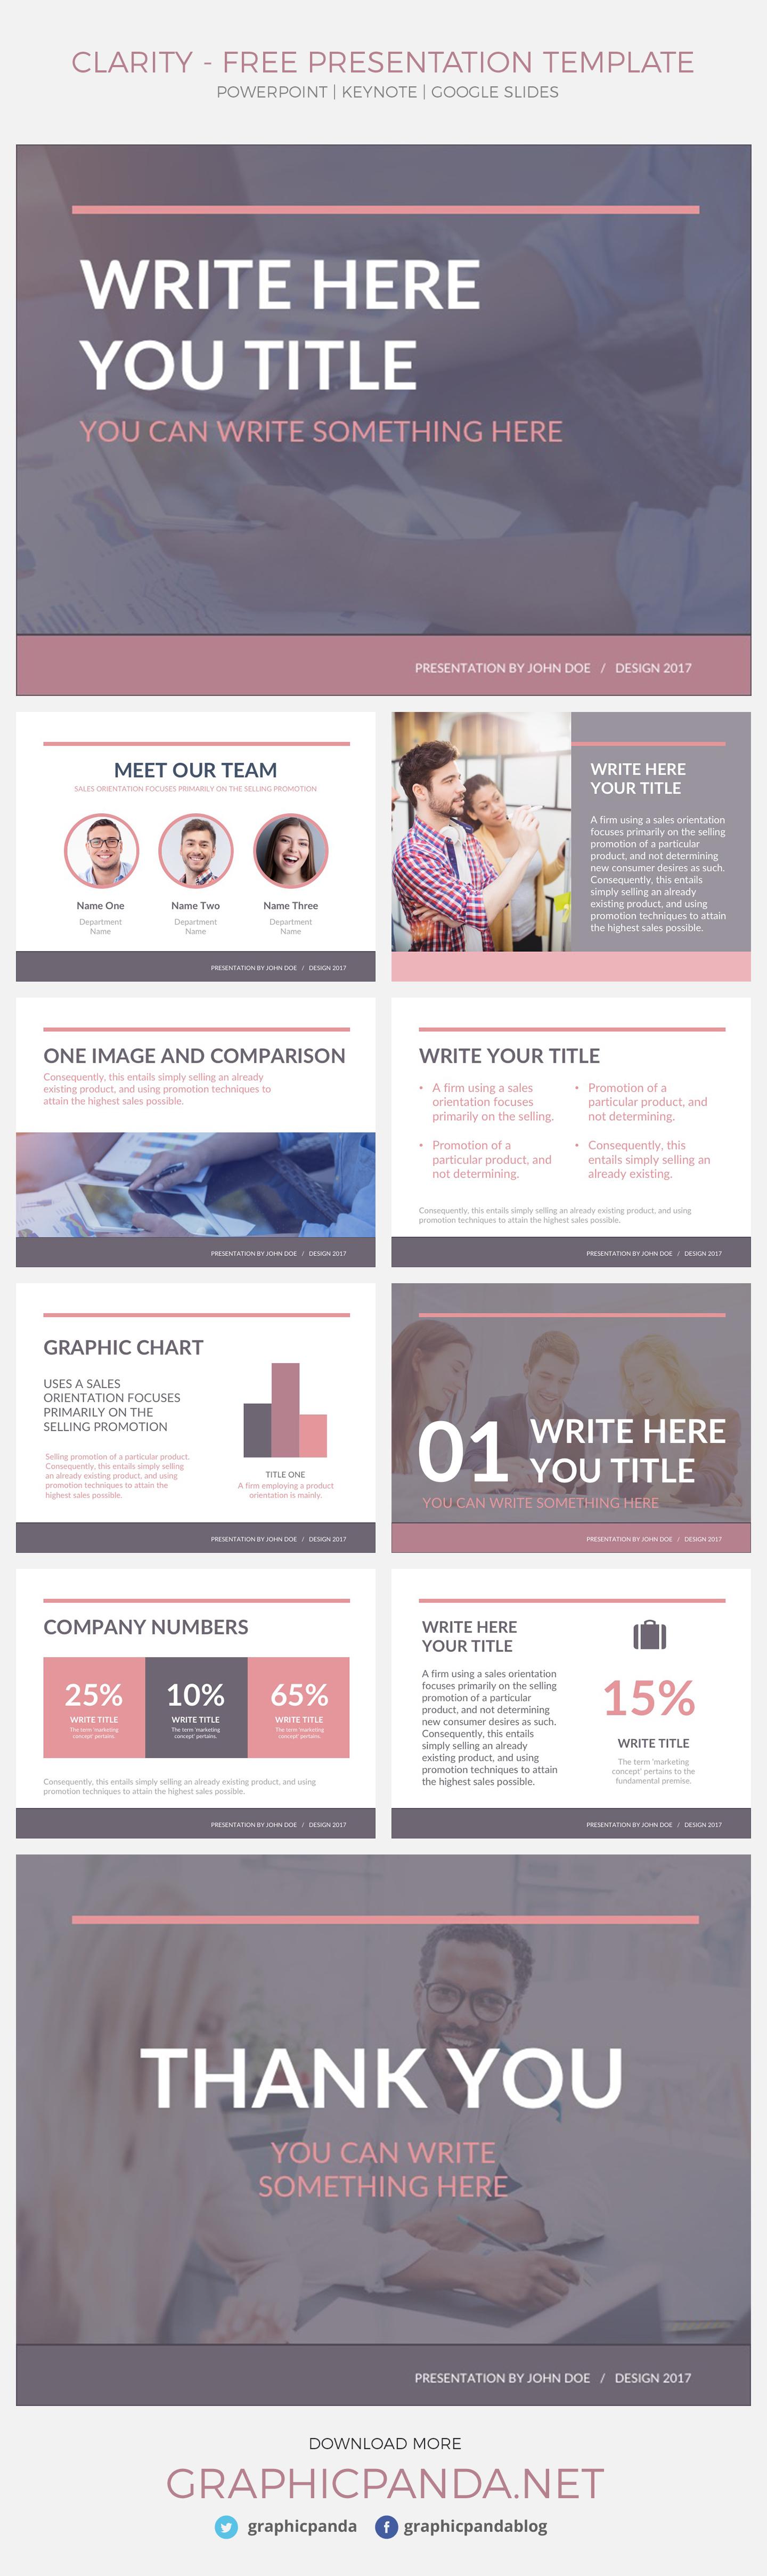 Orientation powerpoint presentation template vatozozdevelopment orientation powerpoint presentation template toneelgroepblik Choice Image